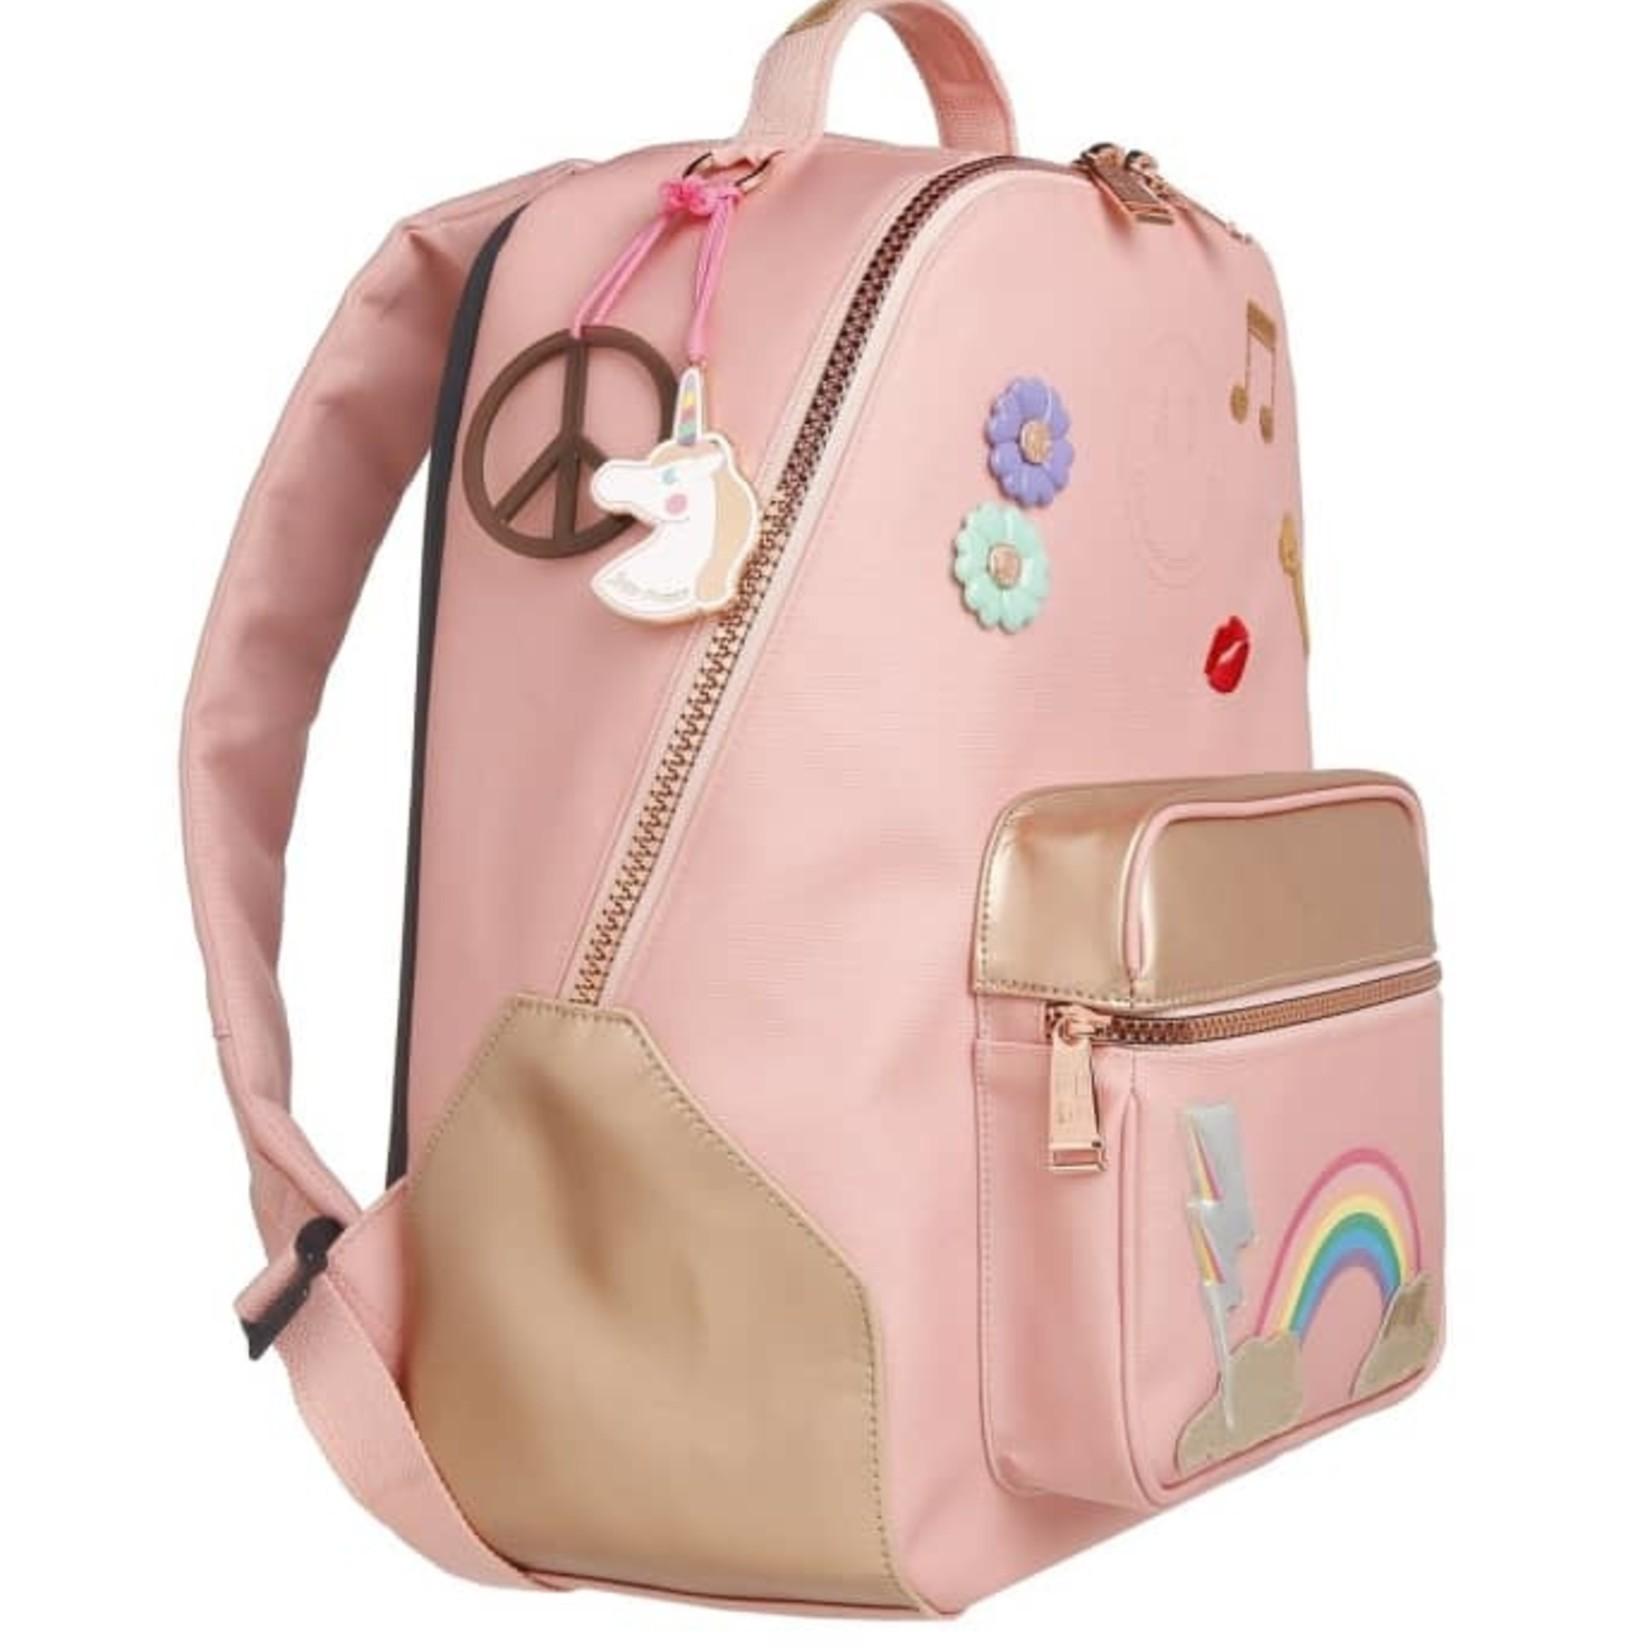 Rucksack Bobbie Lady Gadget PinkBackpack Bobbie lady Gadget Pi